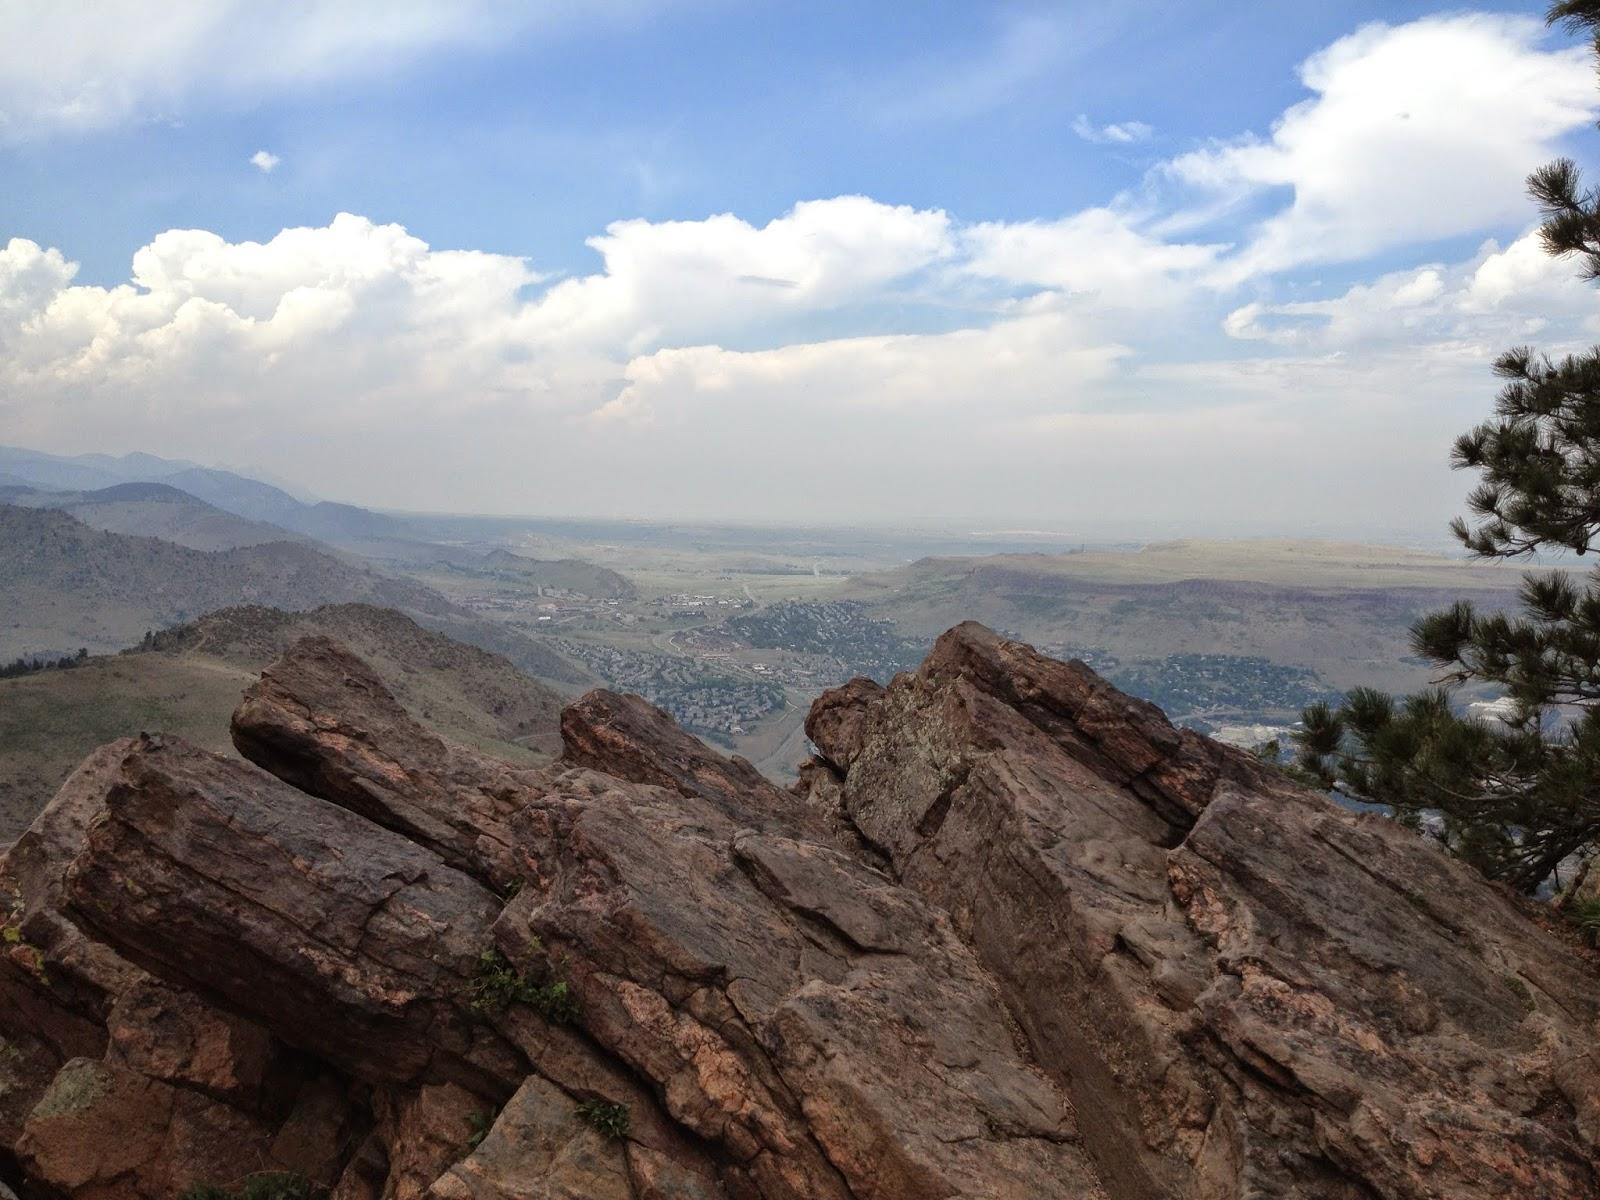 Elevation Gain Stone Mountain Hike : Go hike colorado buffalo bill trail to lookout mountain